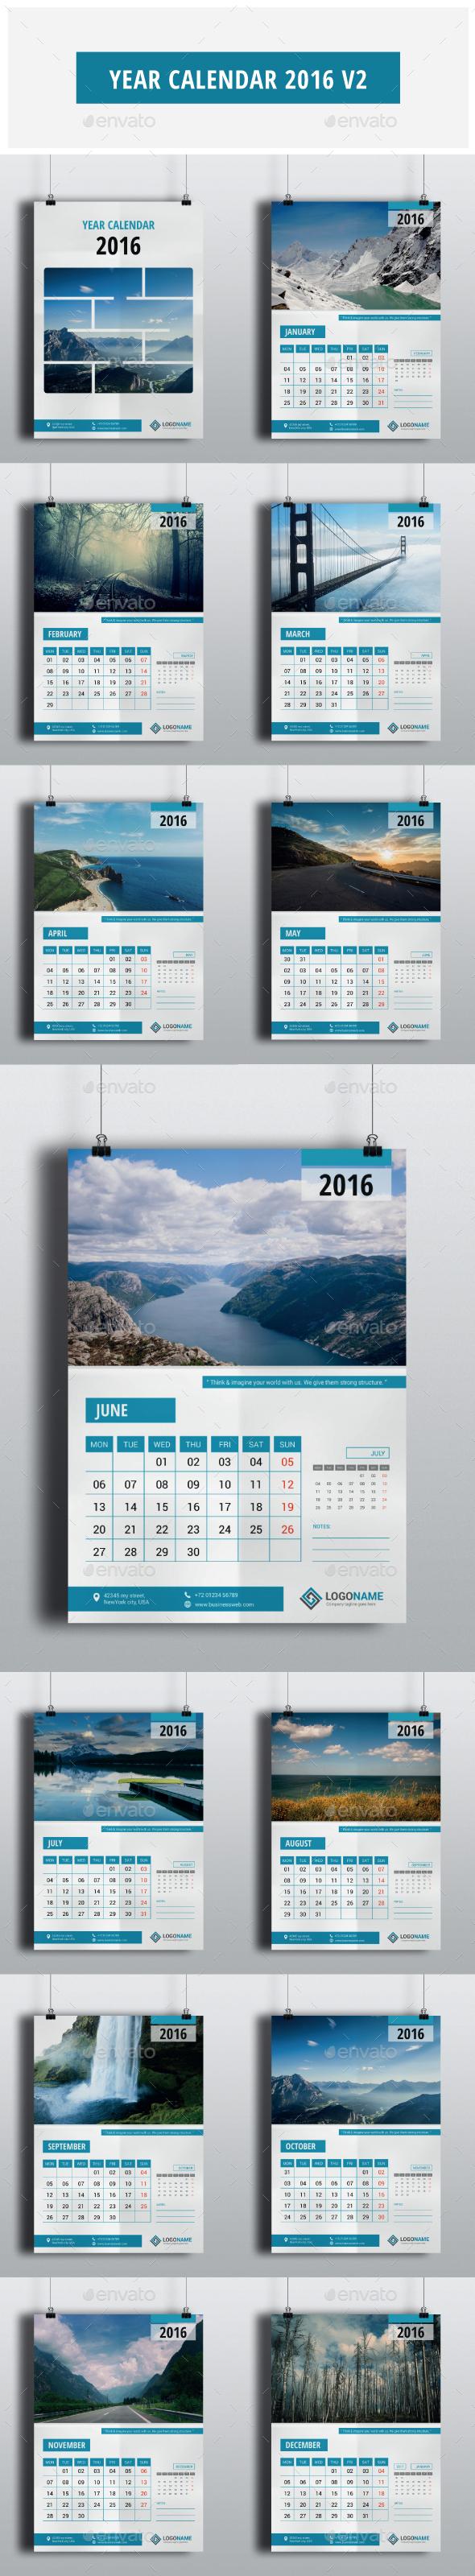 Year Calendar 2016 V2 - Calendars Stationery